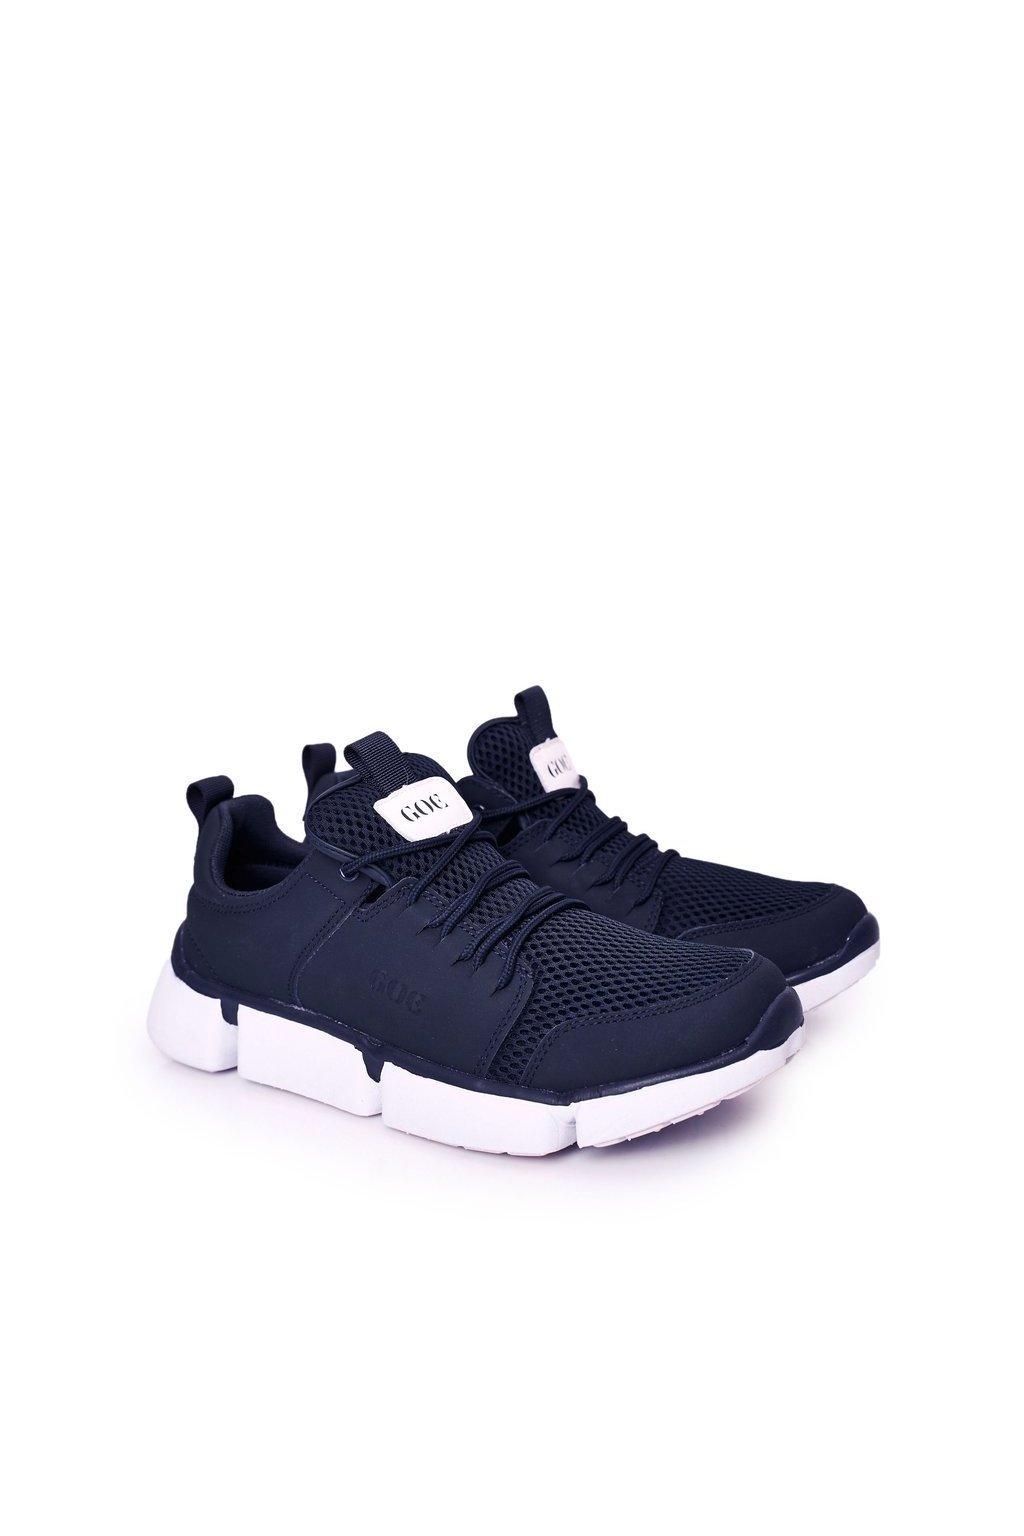 Modrá obuv kód topánok HH1N4031 NAVY